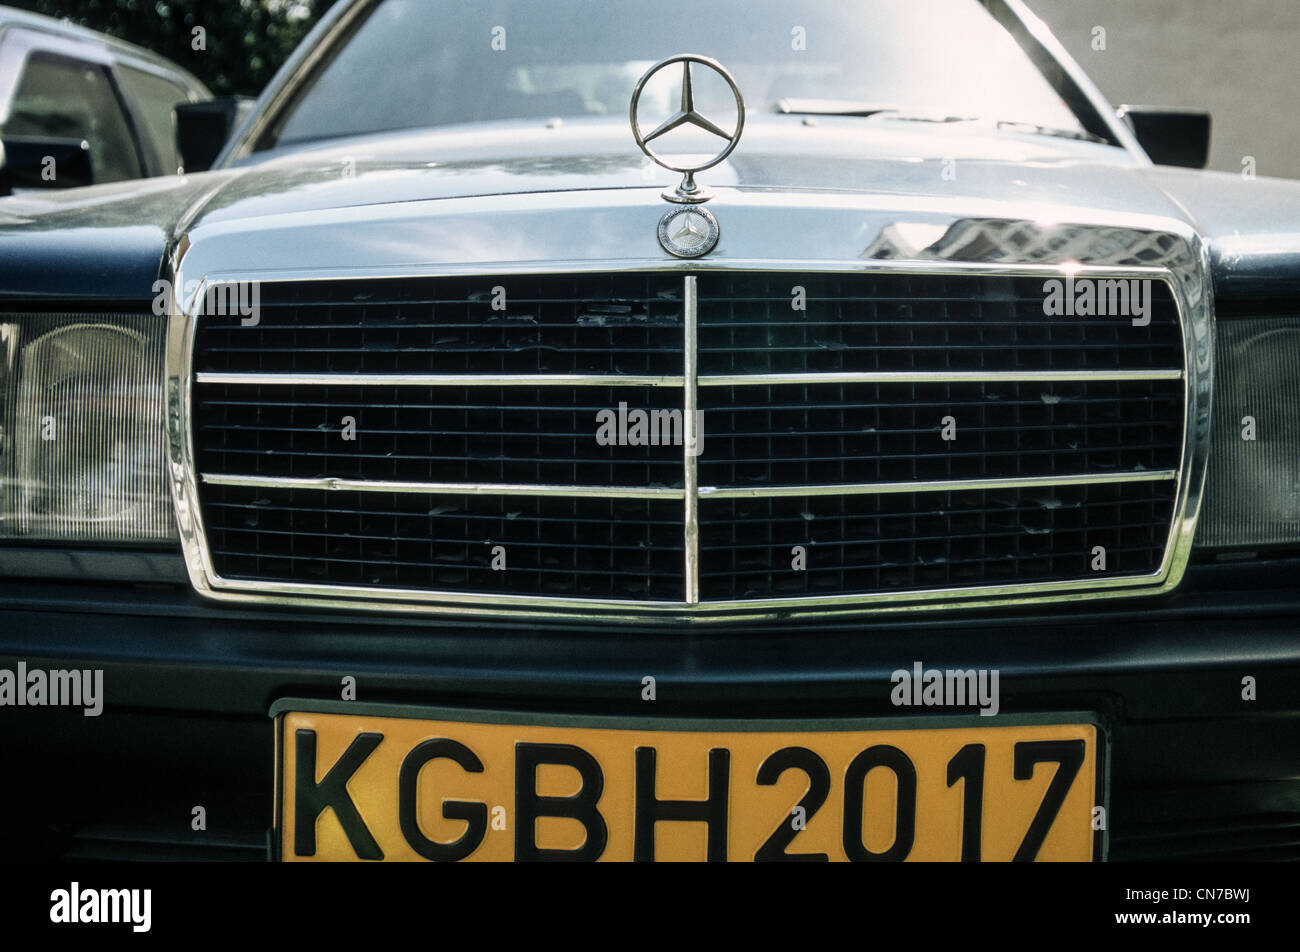 Mercedes-Benz car with KGB license plate, Bishkek, Kyrgyzstan - Stock Image